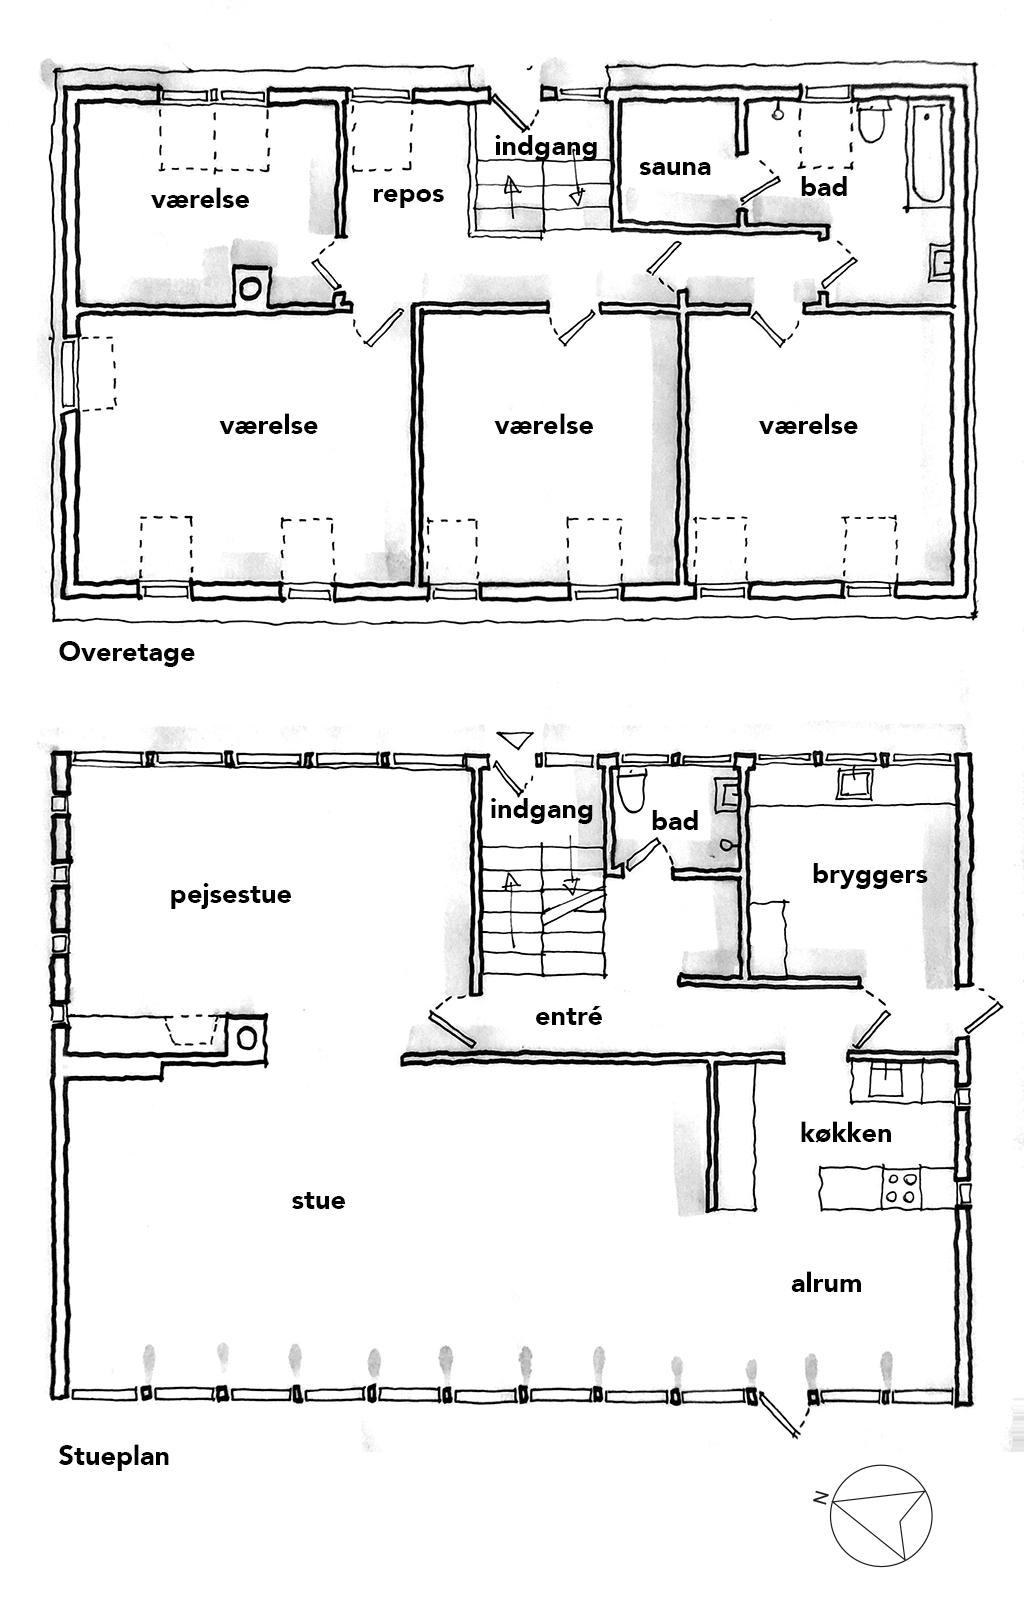 Planskitse, arkitekttegning